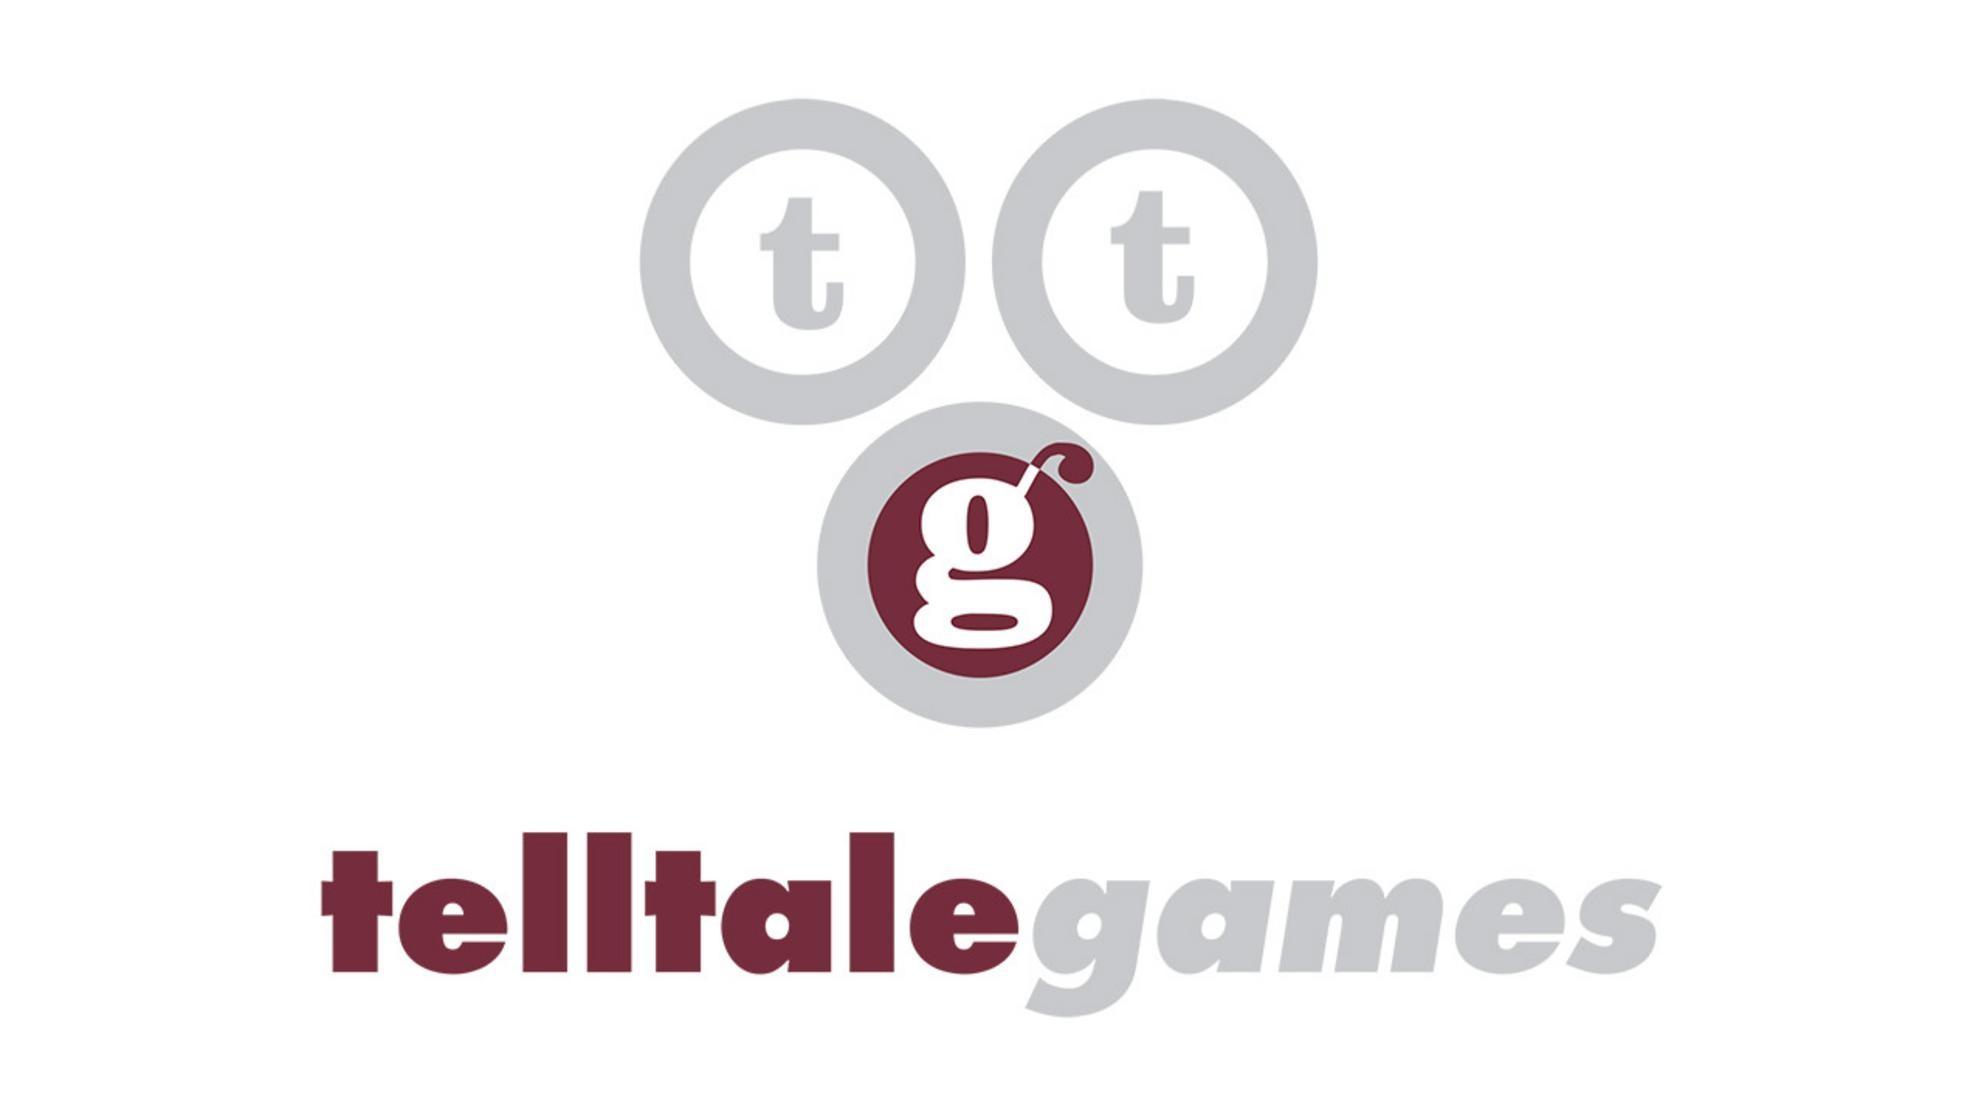 Telltale Games reveals studio closure and major layoffs